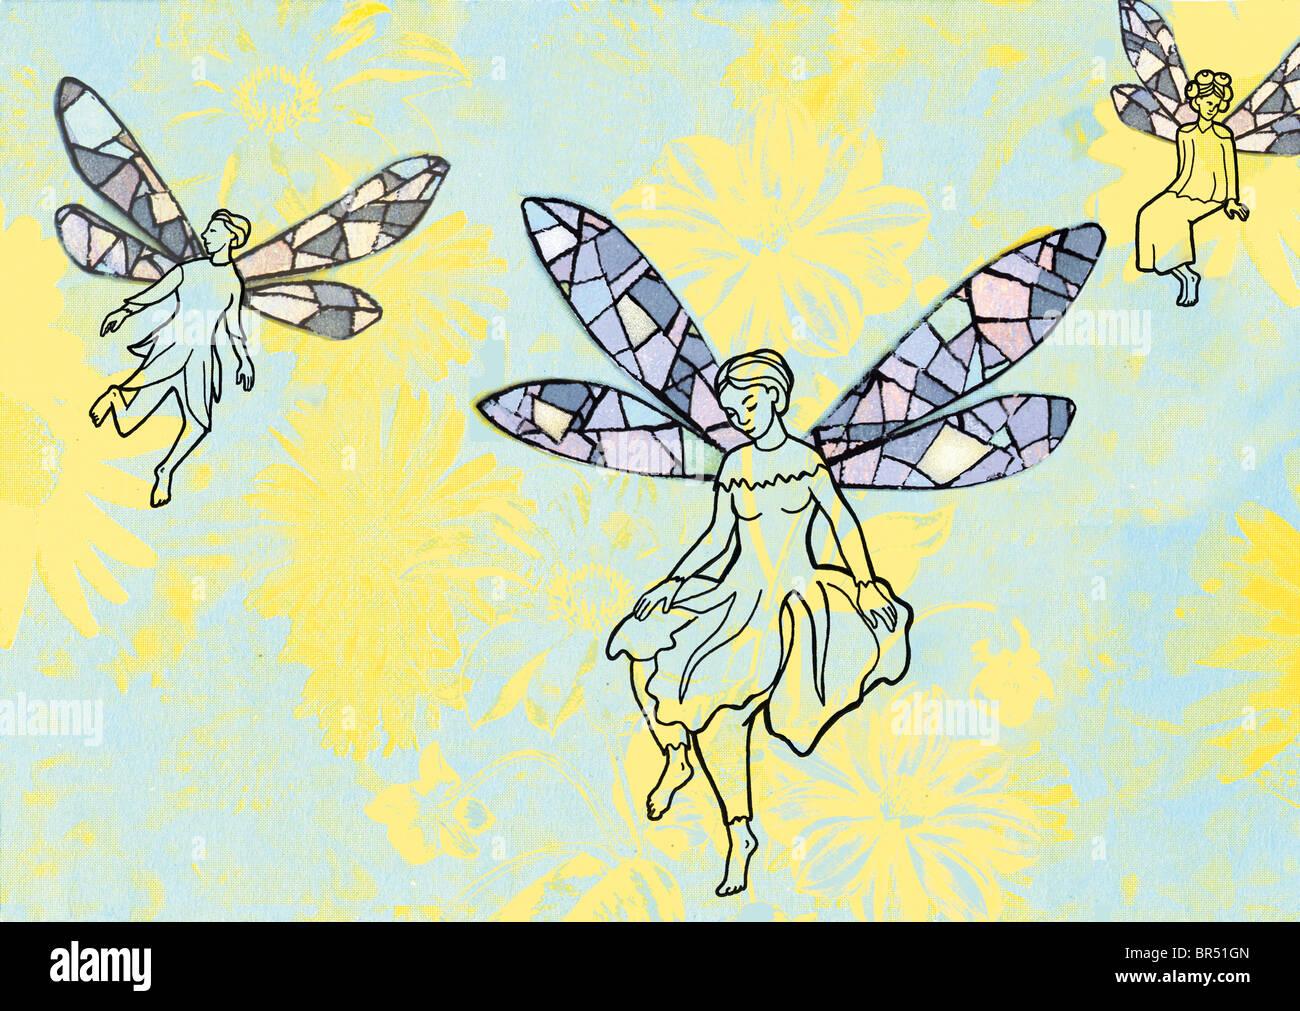 Fairies flying among beautiful flowers - Stock Image